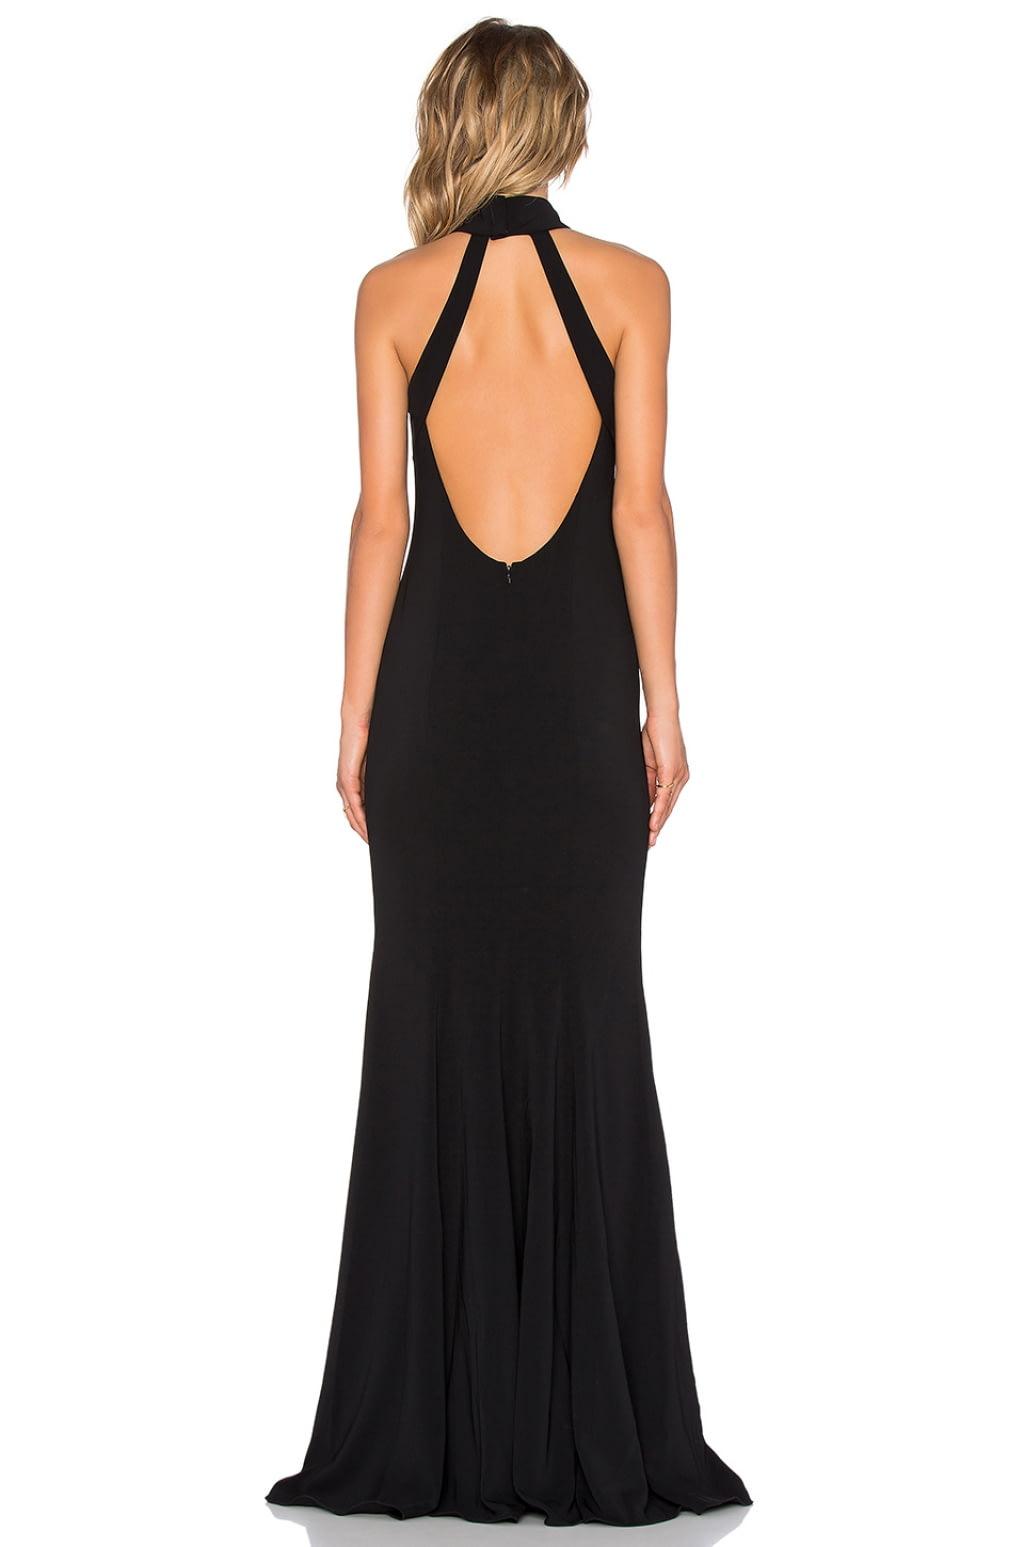 Buy Original Jay Godfrey Cameo Dress At Indonesia Bobobobo Atsthelabel Eeva Black Top